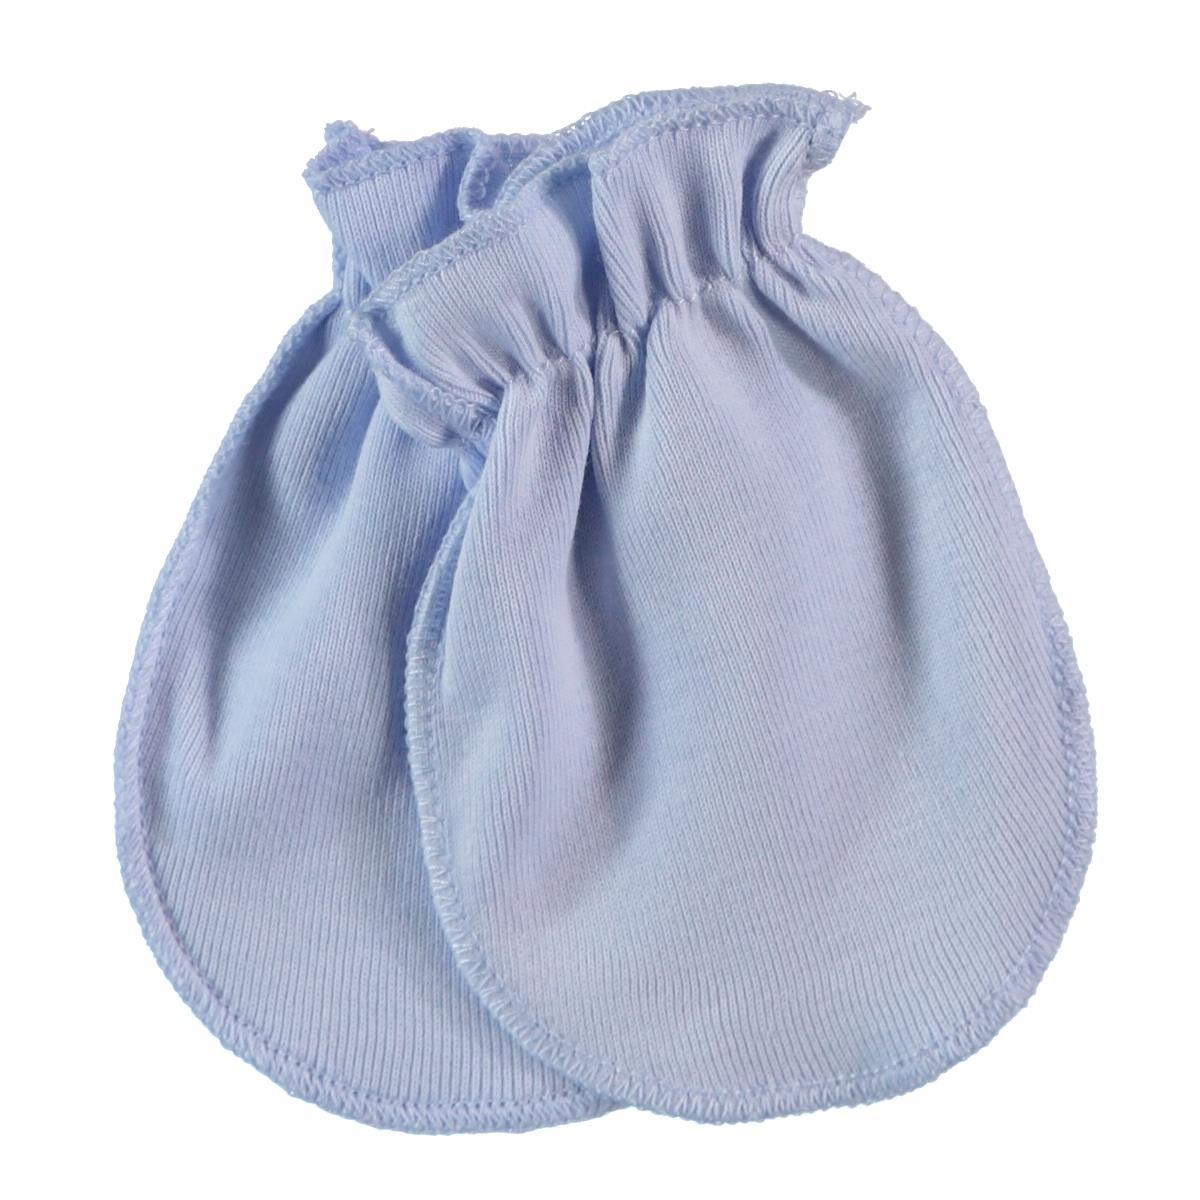 Kujju Baby Blue Gloves